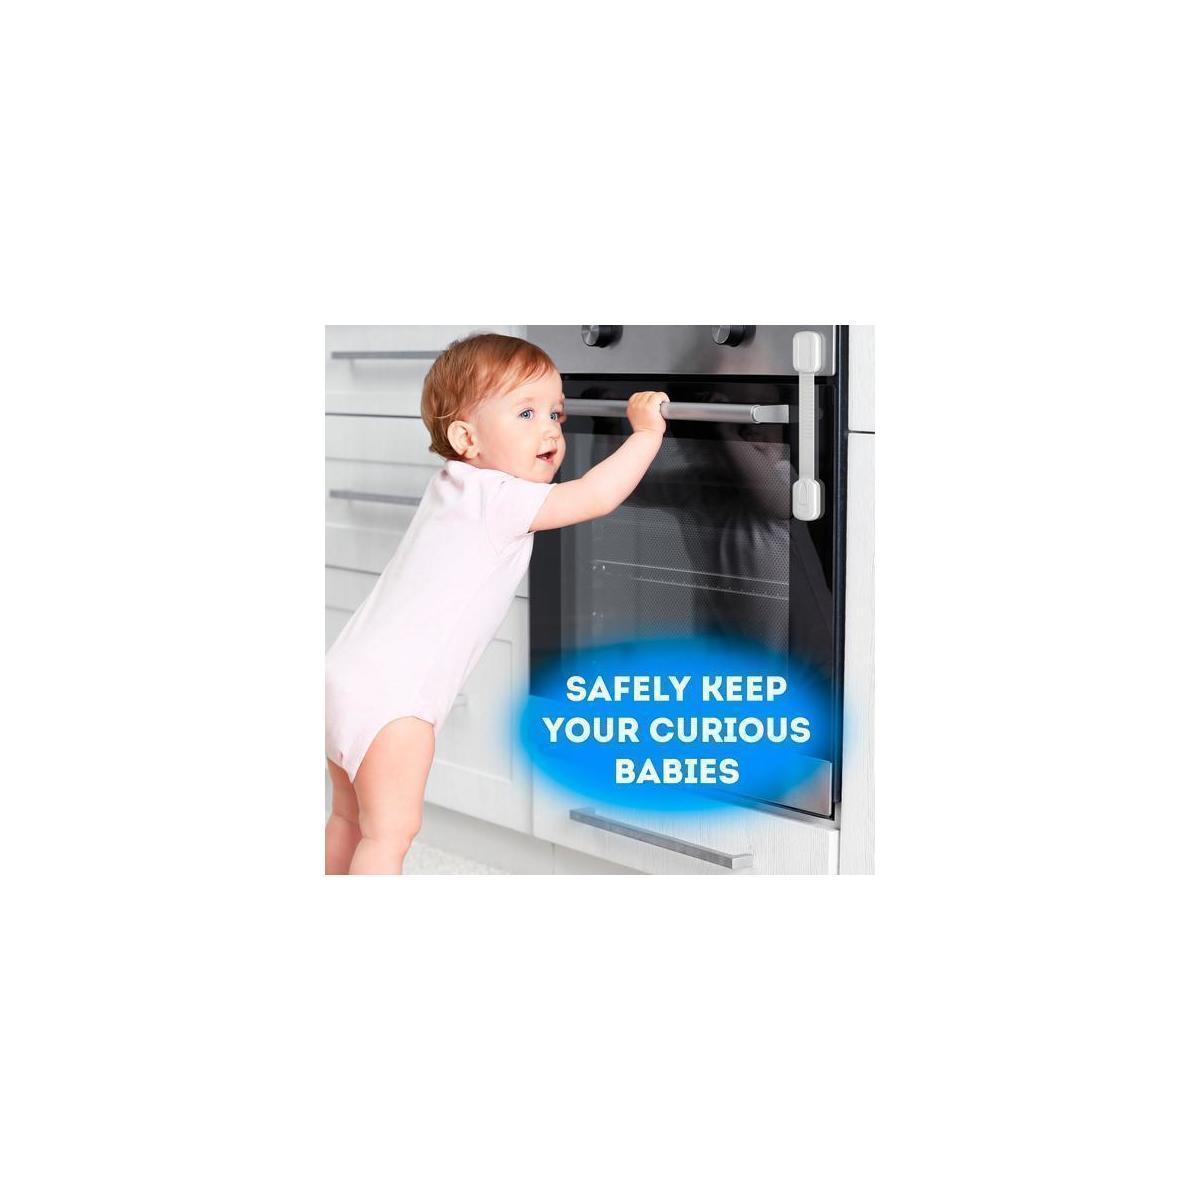 Multipurpose Baby Safety Child Cabinet Lock Latch – Set of 6 Adjustable Locks & 4 Corner Guards